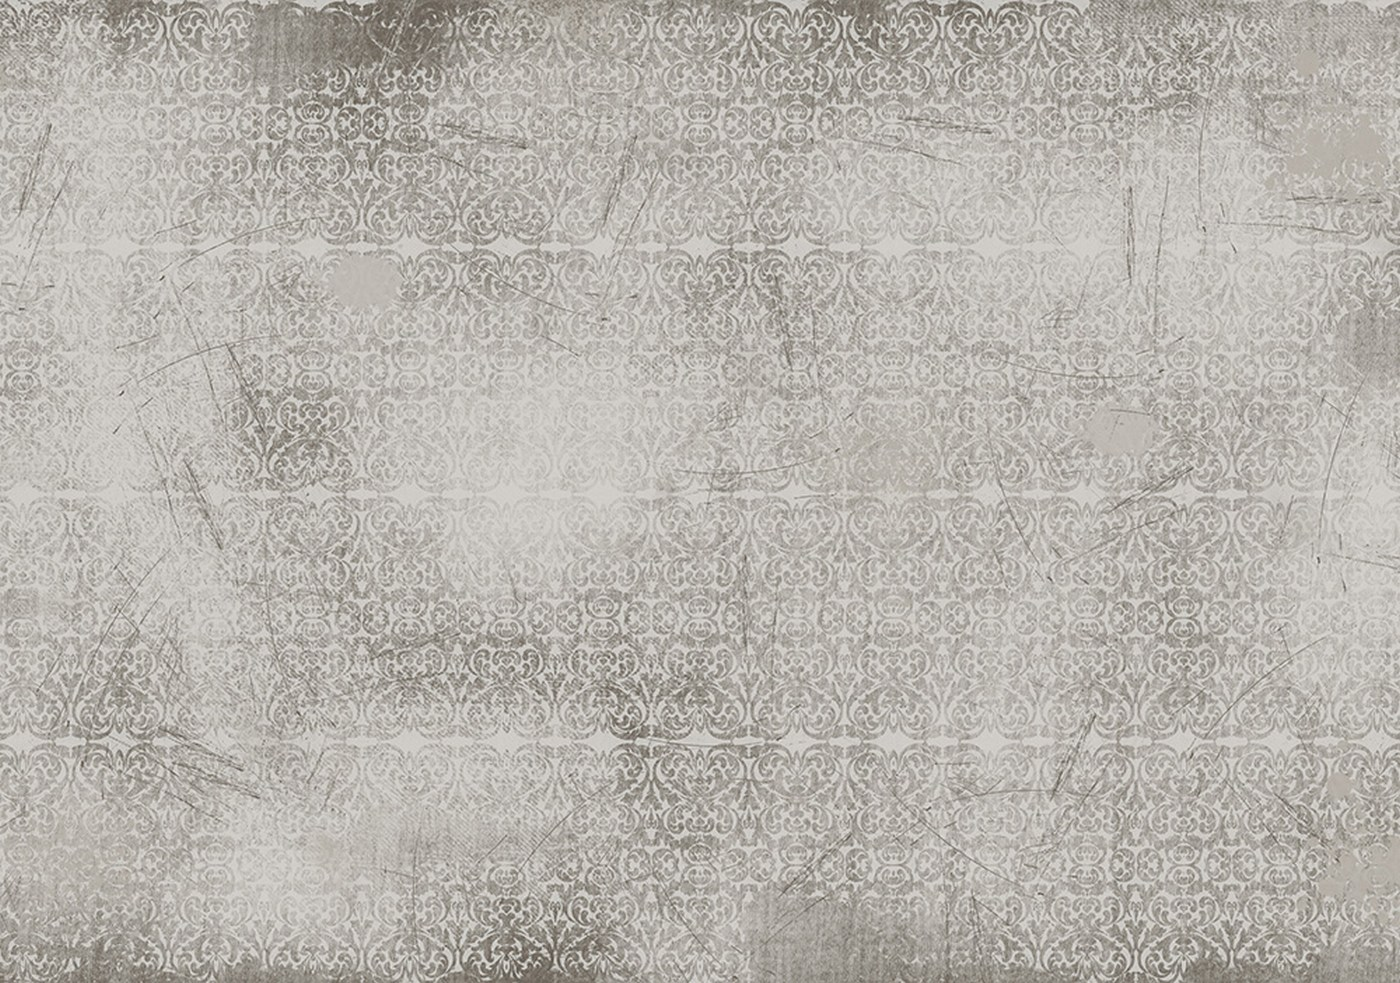 vlies fototapete 2982 ornamente tapete muster design kratzer kunst grau - Tapete Muster Grau